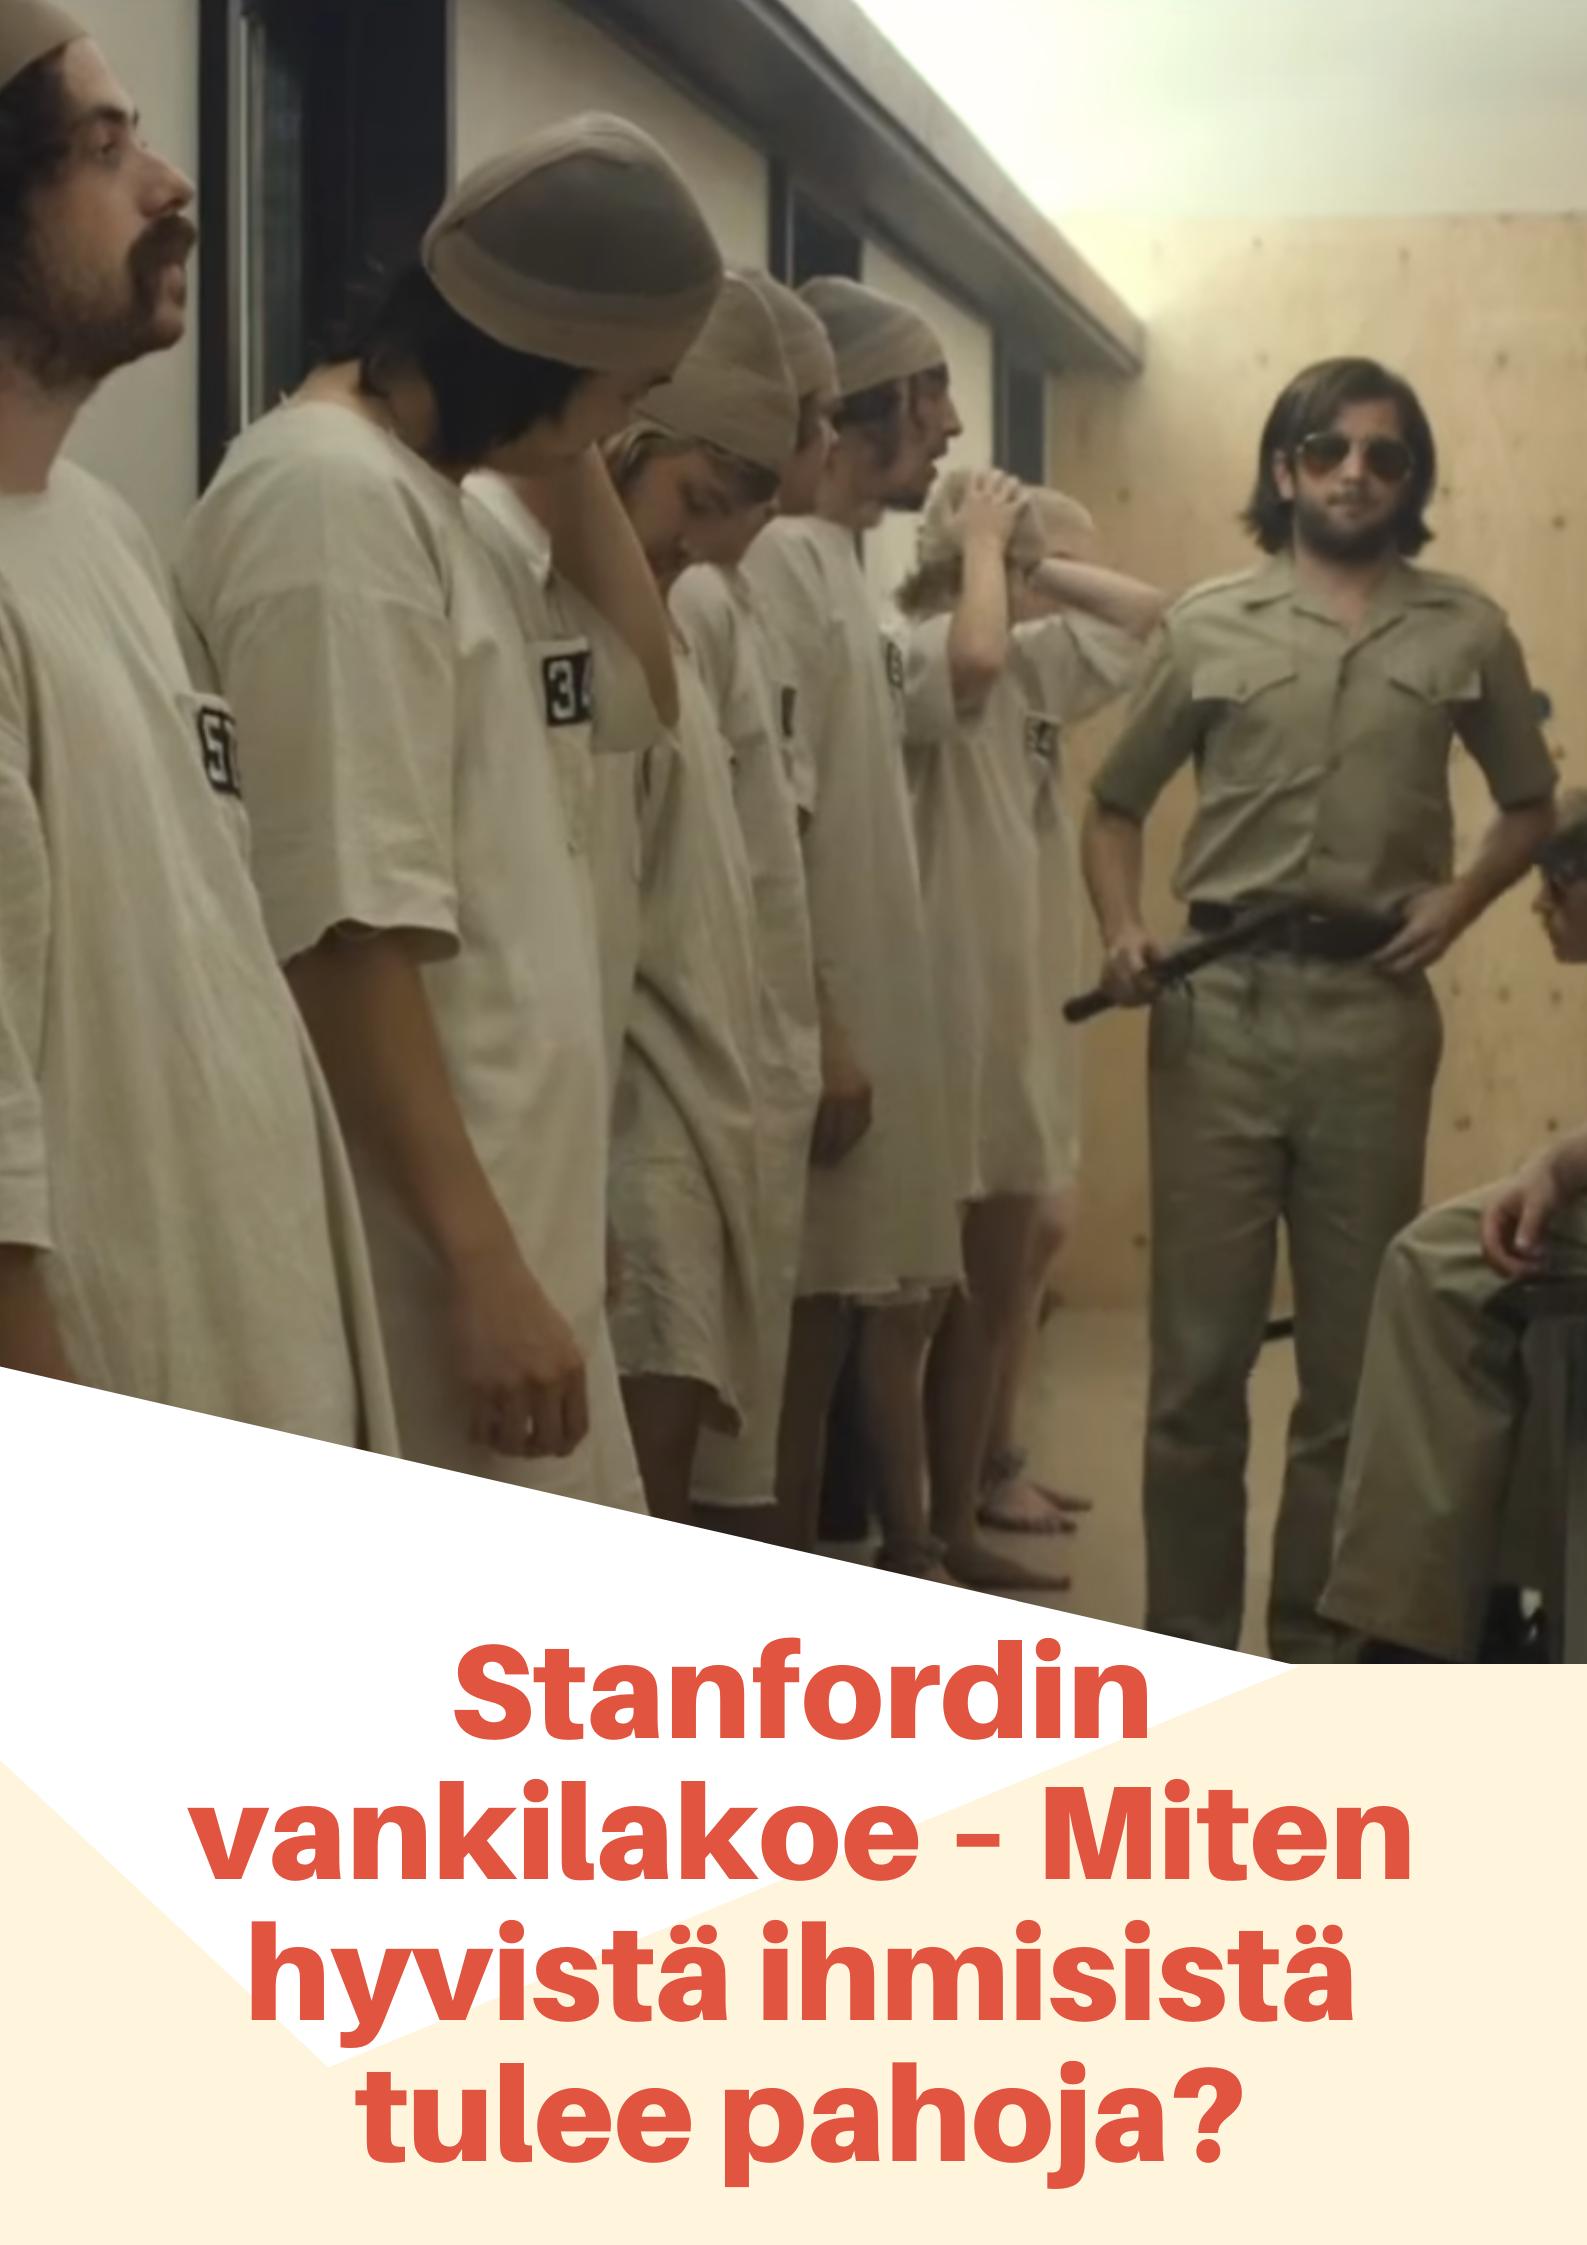 Stanfordin Vankilakoe